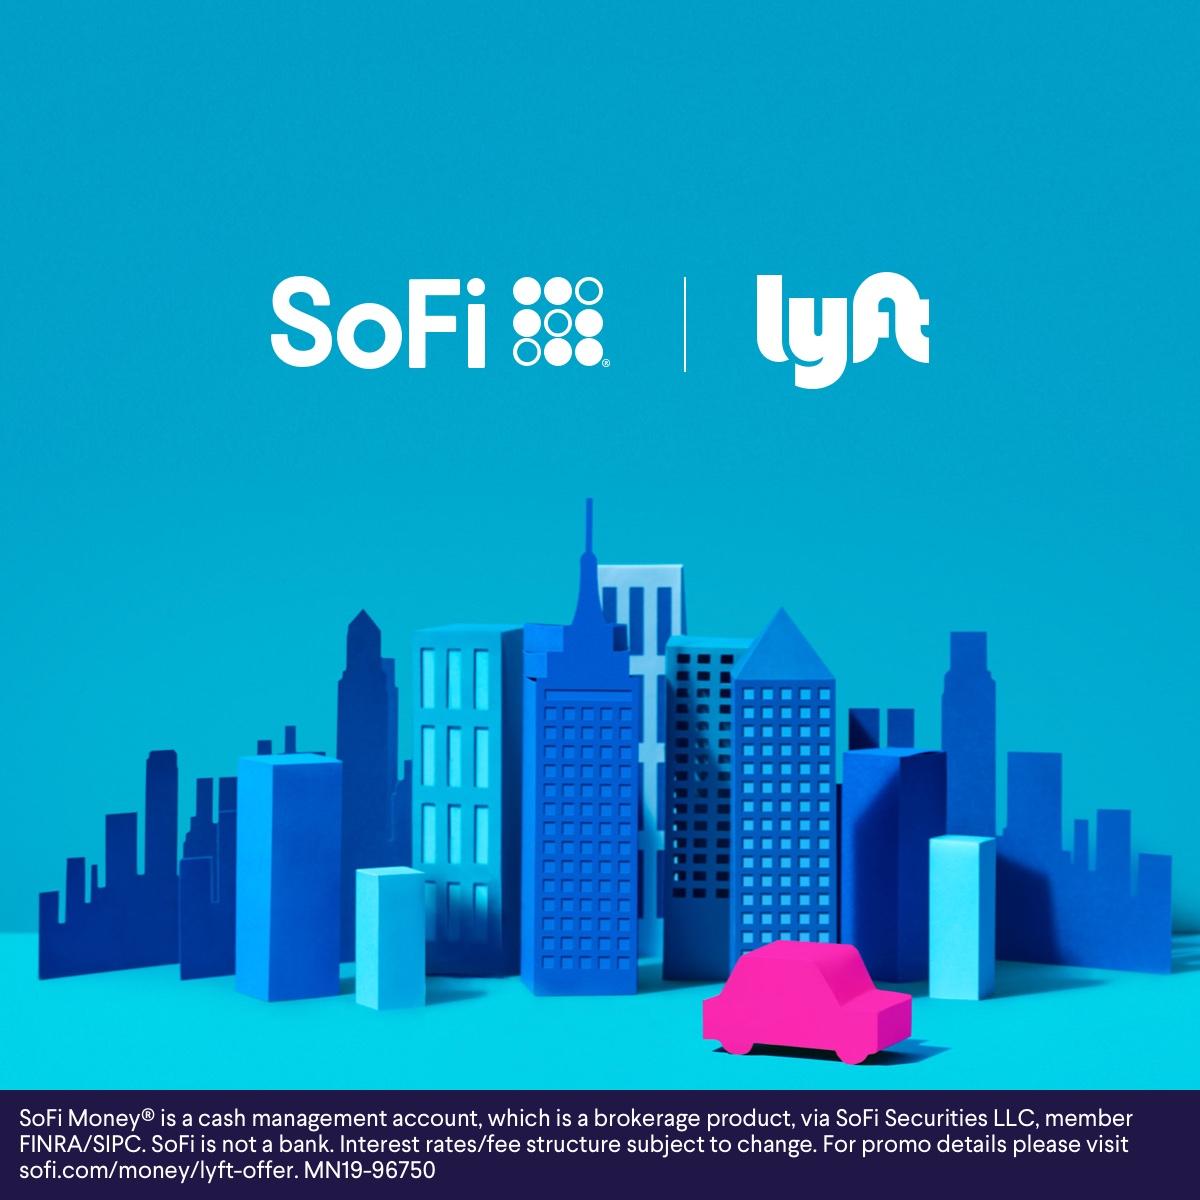 20% cashback on all Lyft Rides for SoFi members (through 2/18/2020)